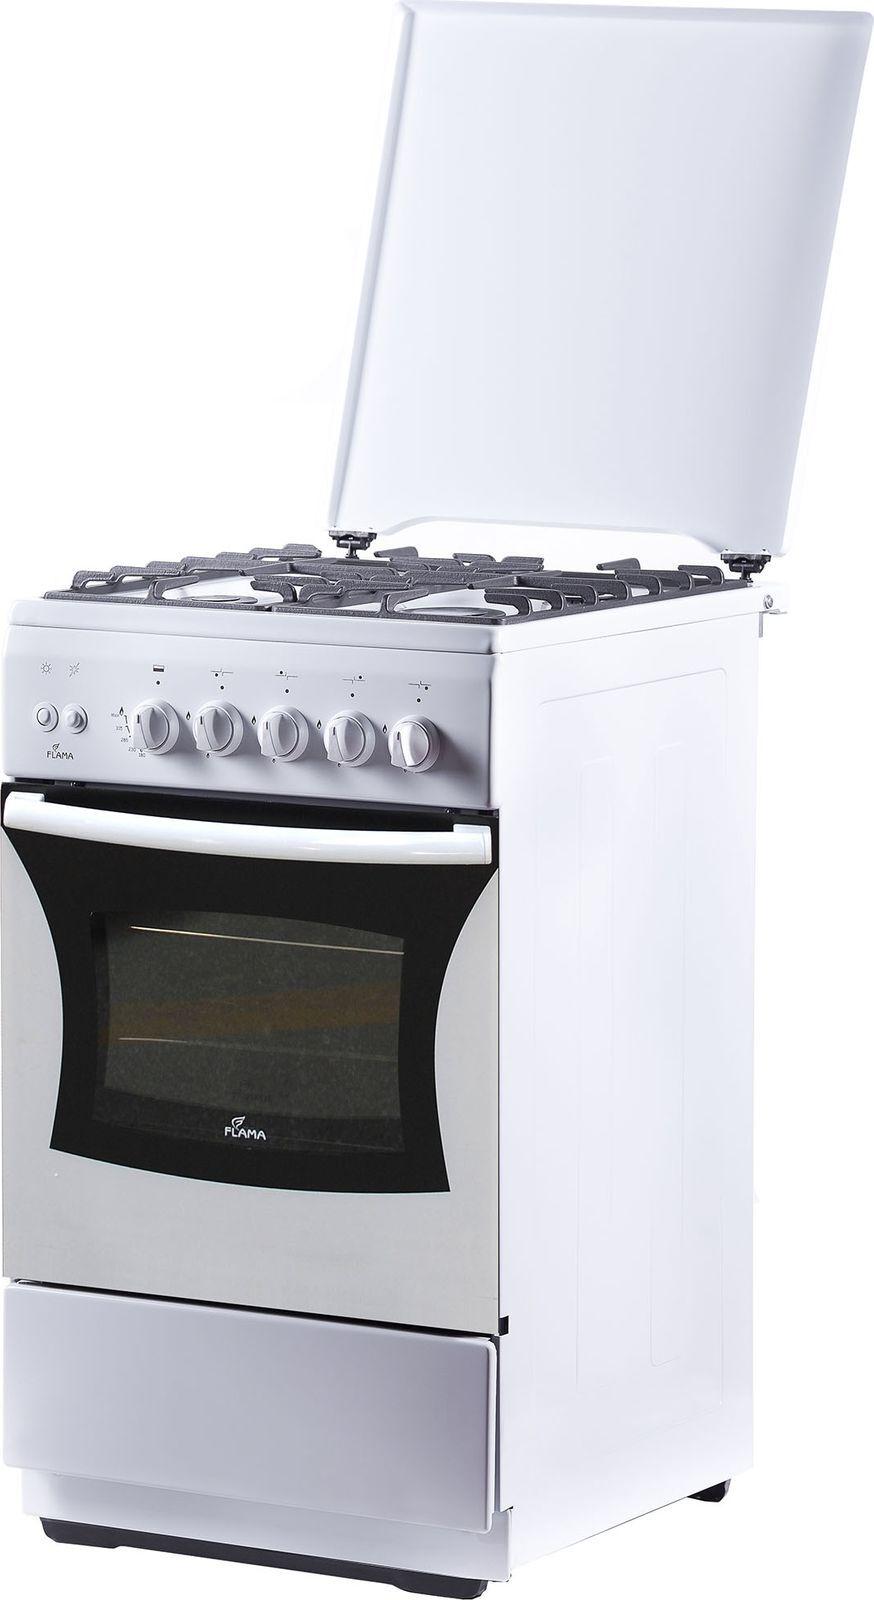 Кухонная плита Flama FG 24227 W, белый